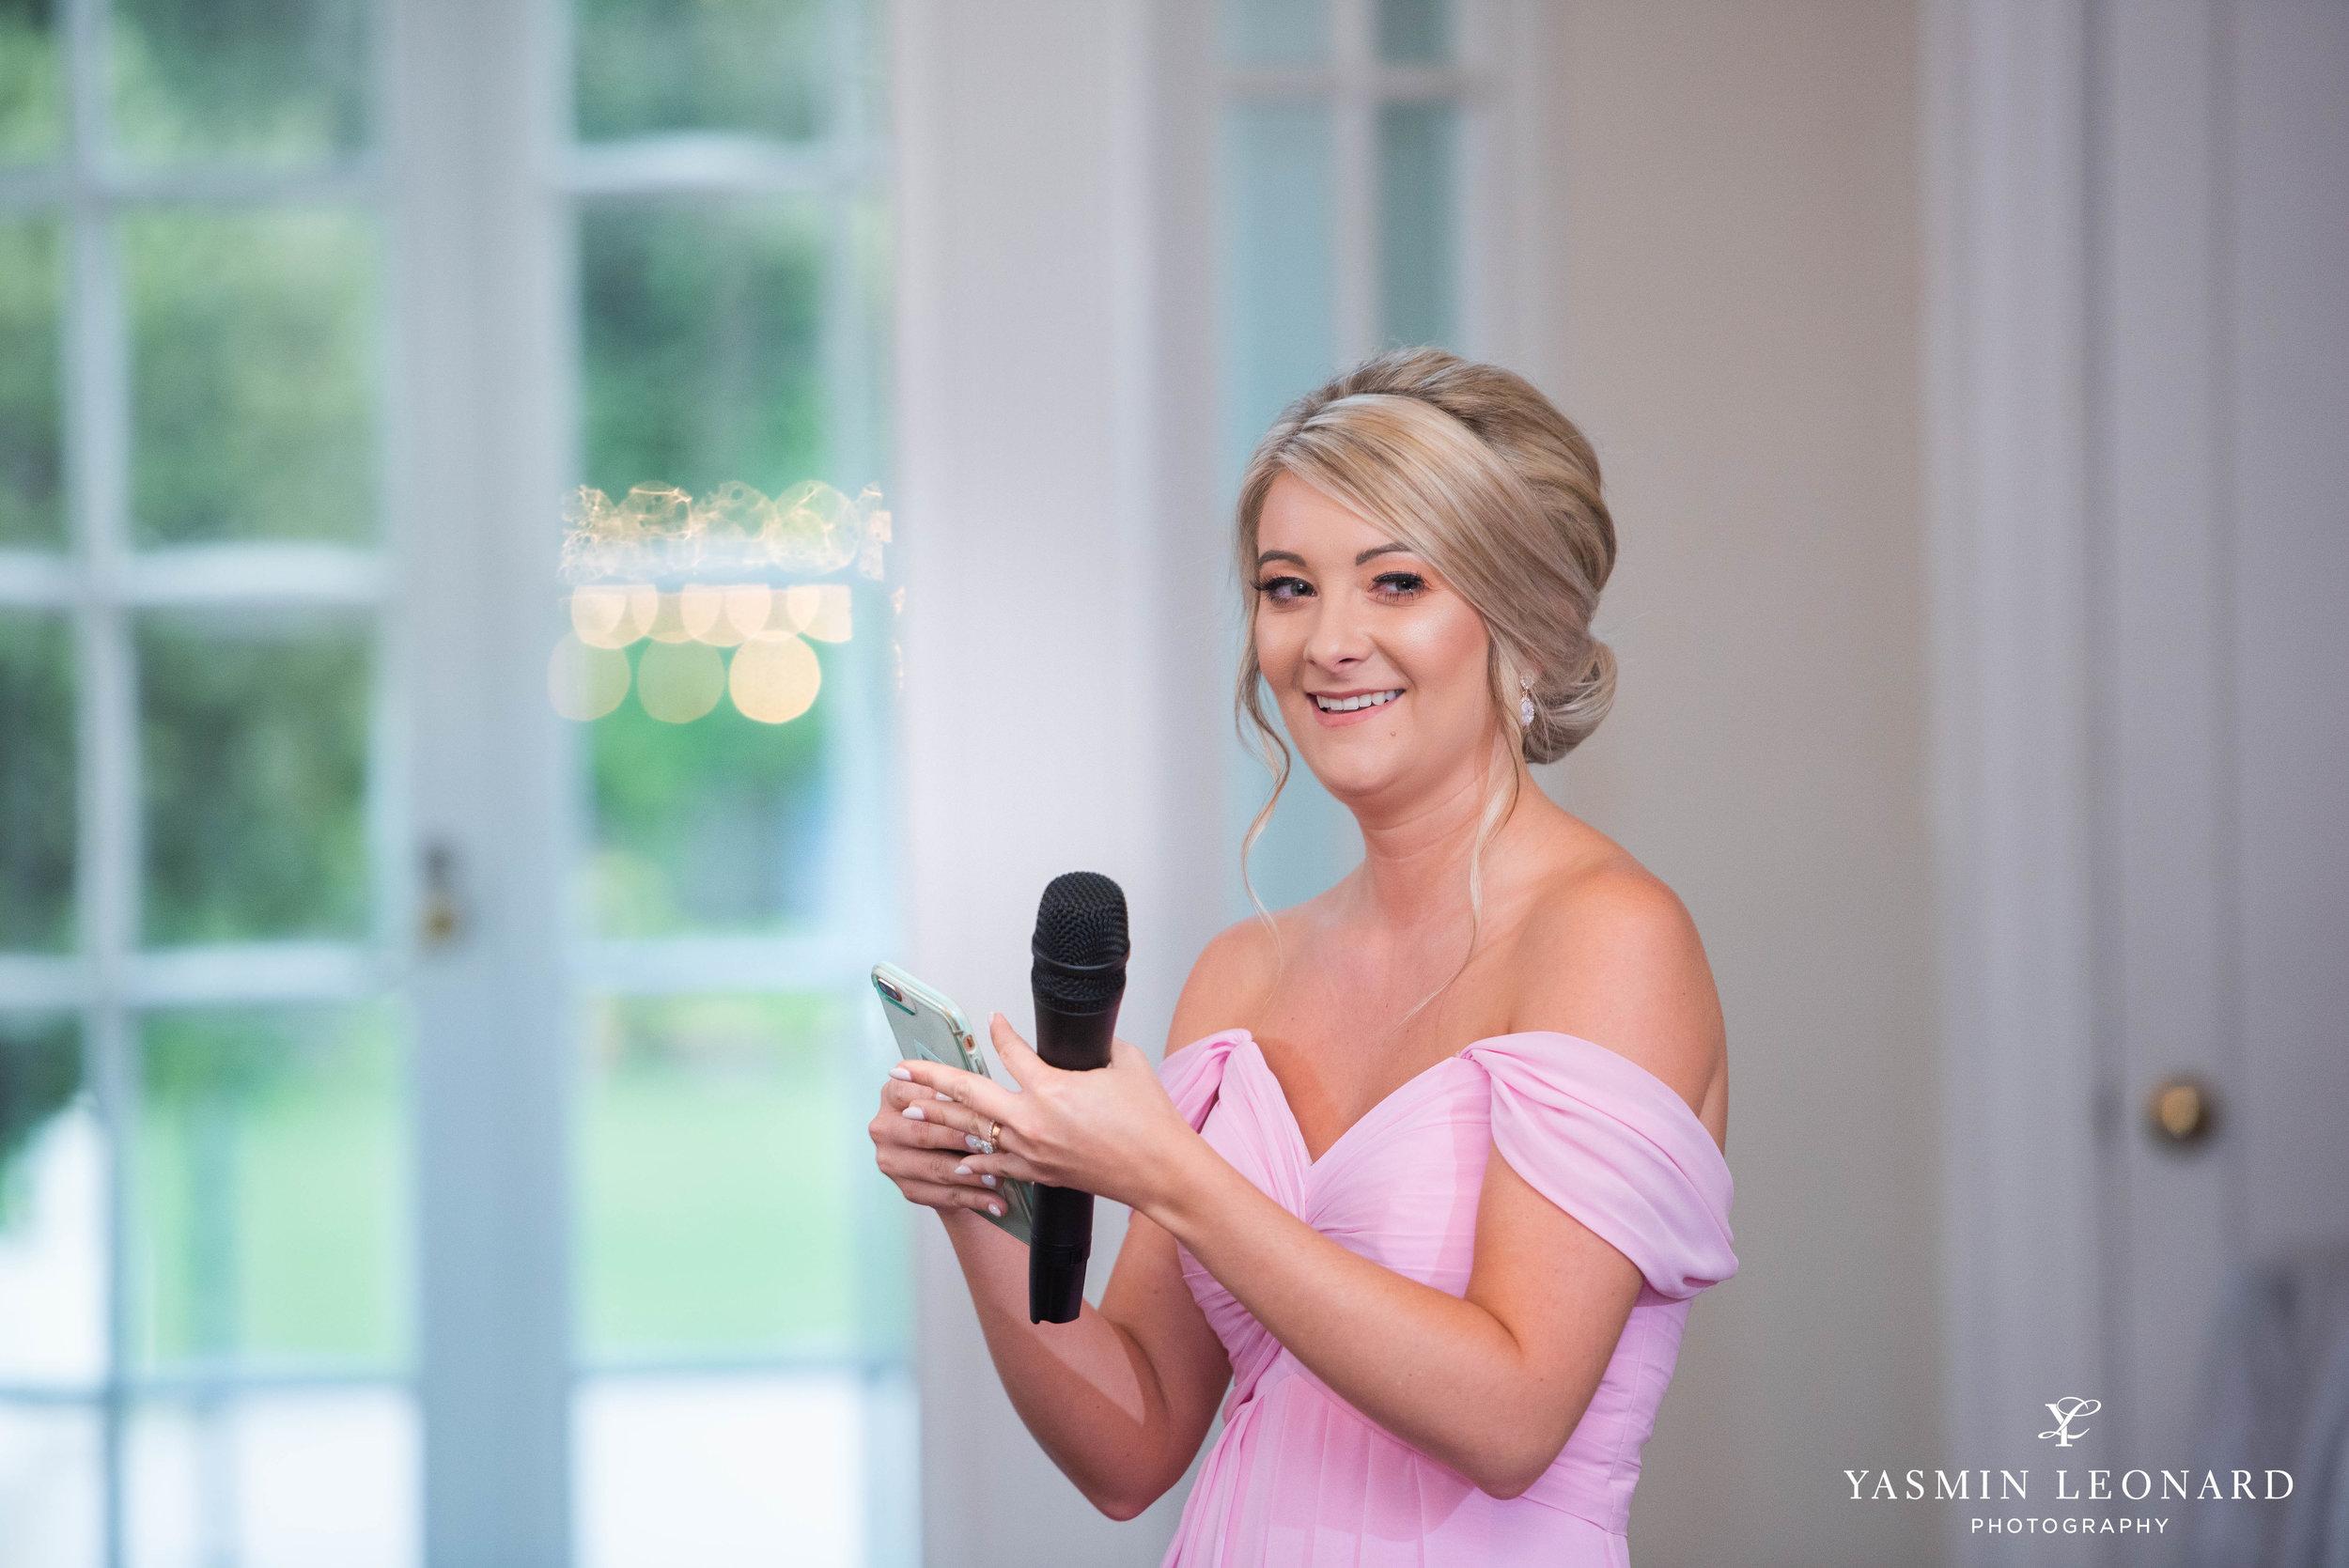 Separk Mansion - NC Weddings - Gastonia Wedding - NC Wedding Venues - Pink and Blue Wedding Ideas - Pink Bridesmaid Dresses - Yasmin Leonard Photography-48.jpg